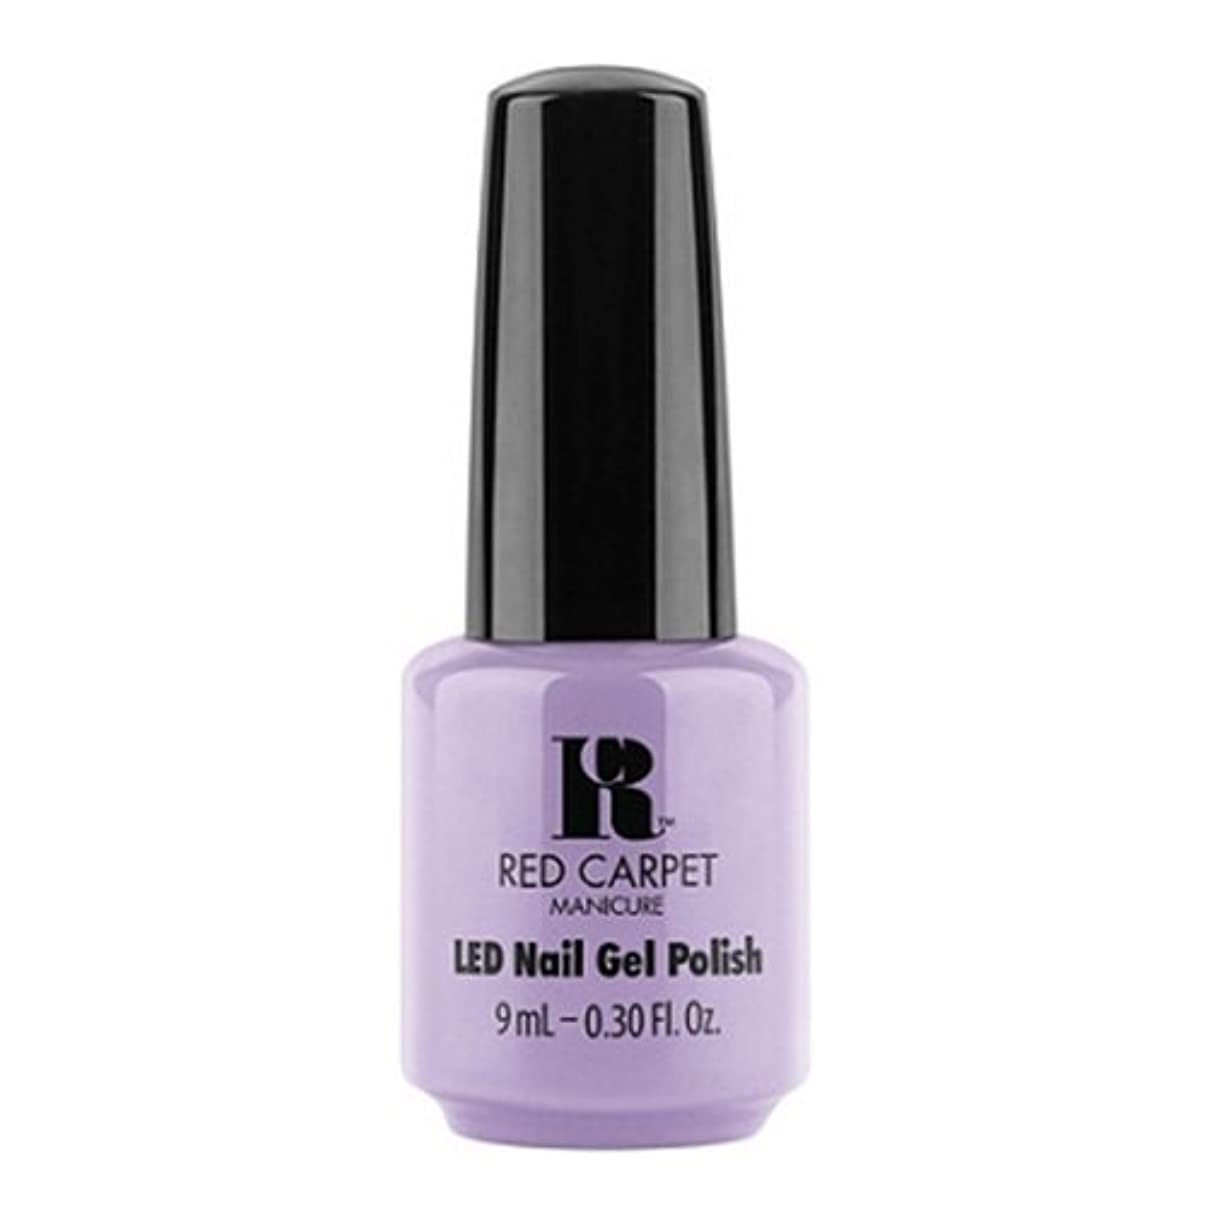 Red Carpet Manicure - LED Nail Gel Polish - PR Darling - 0.3oz / 9ml